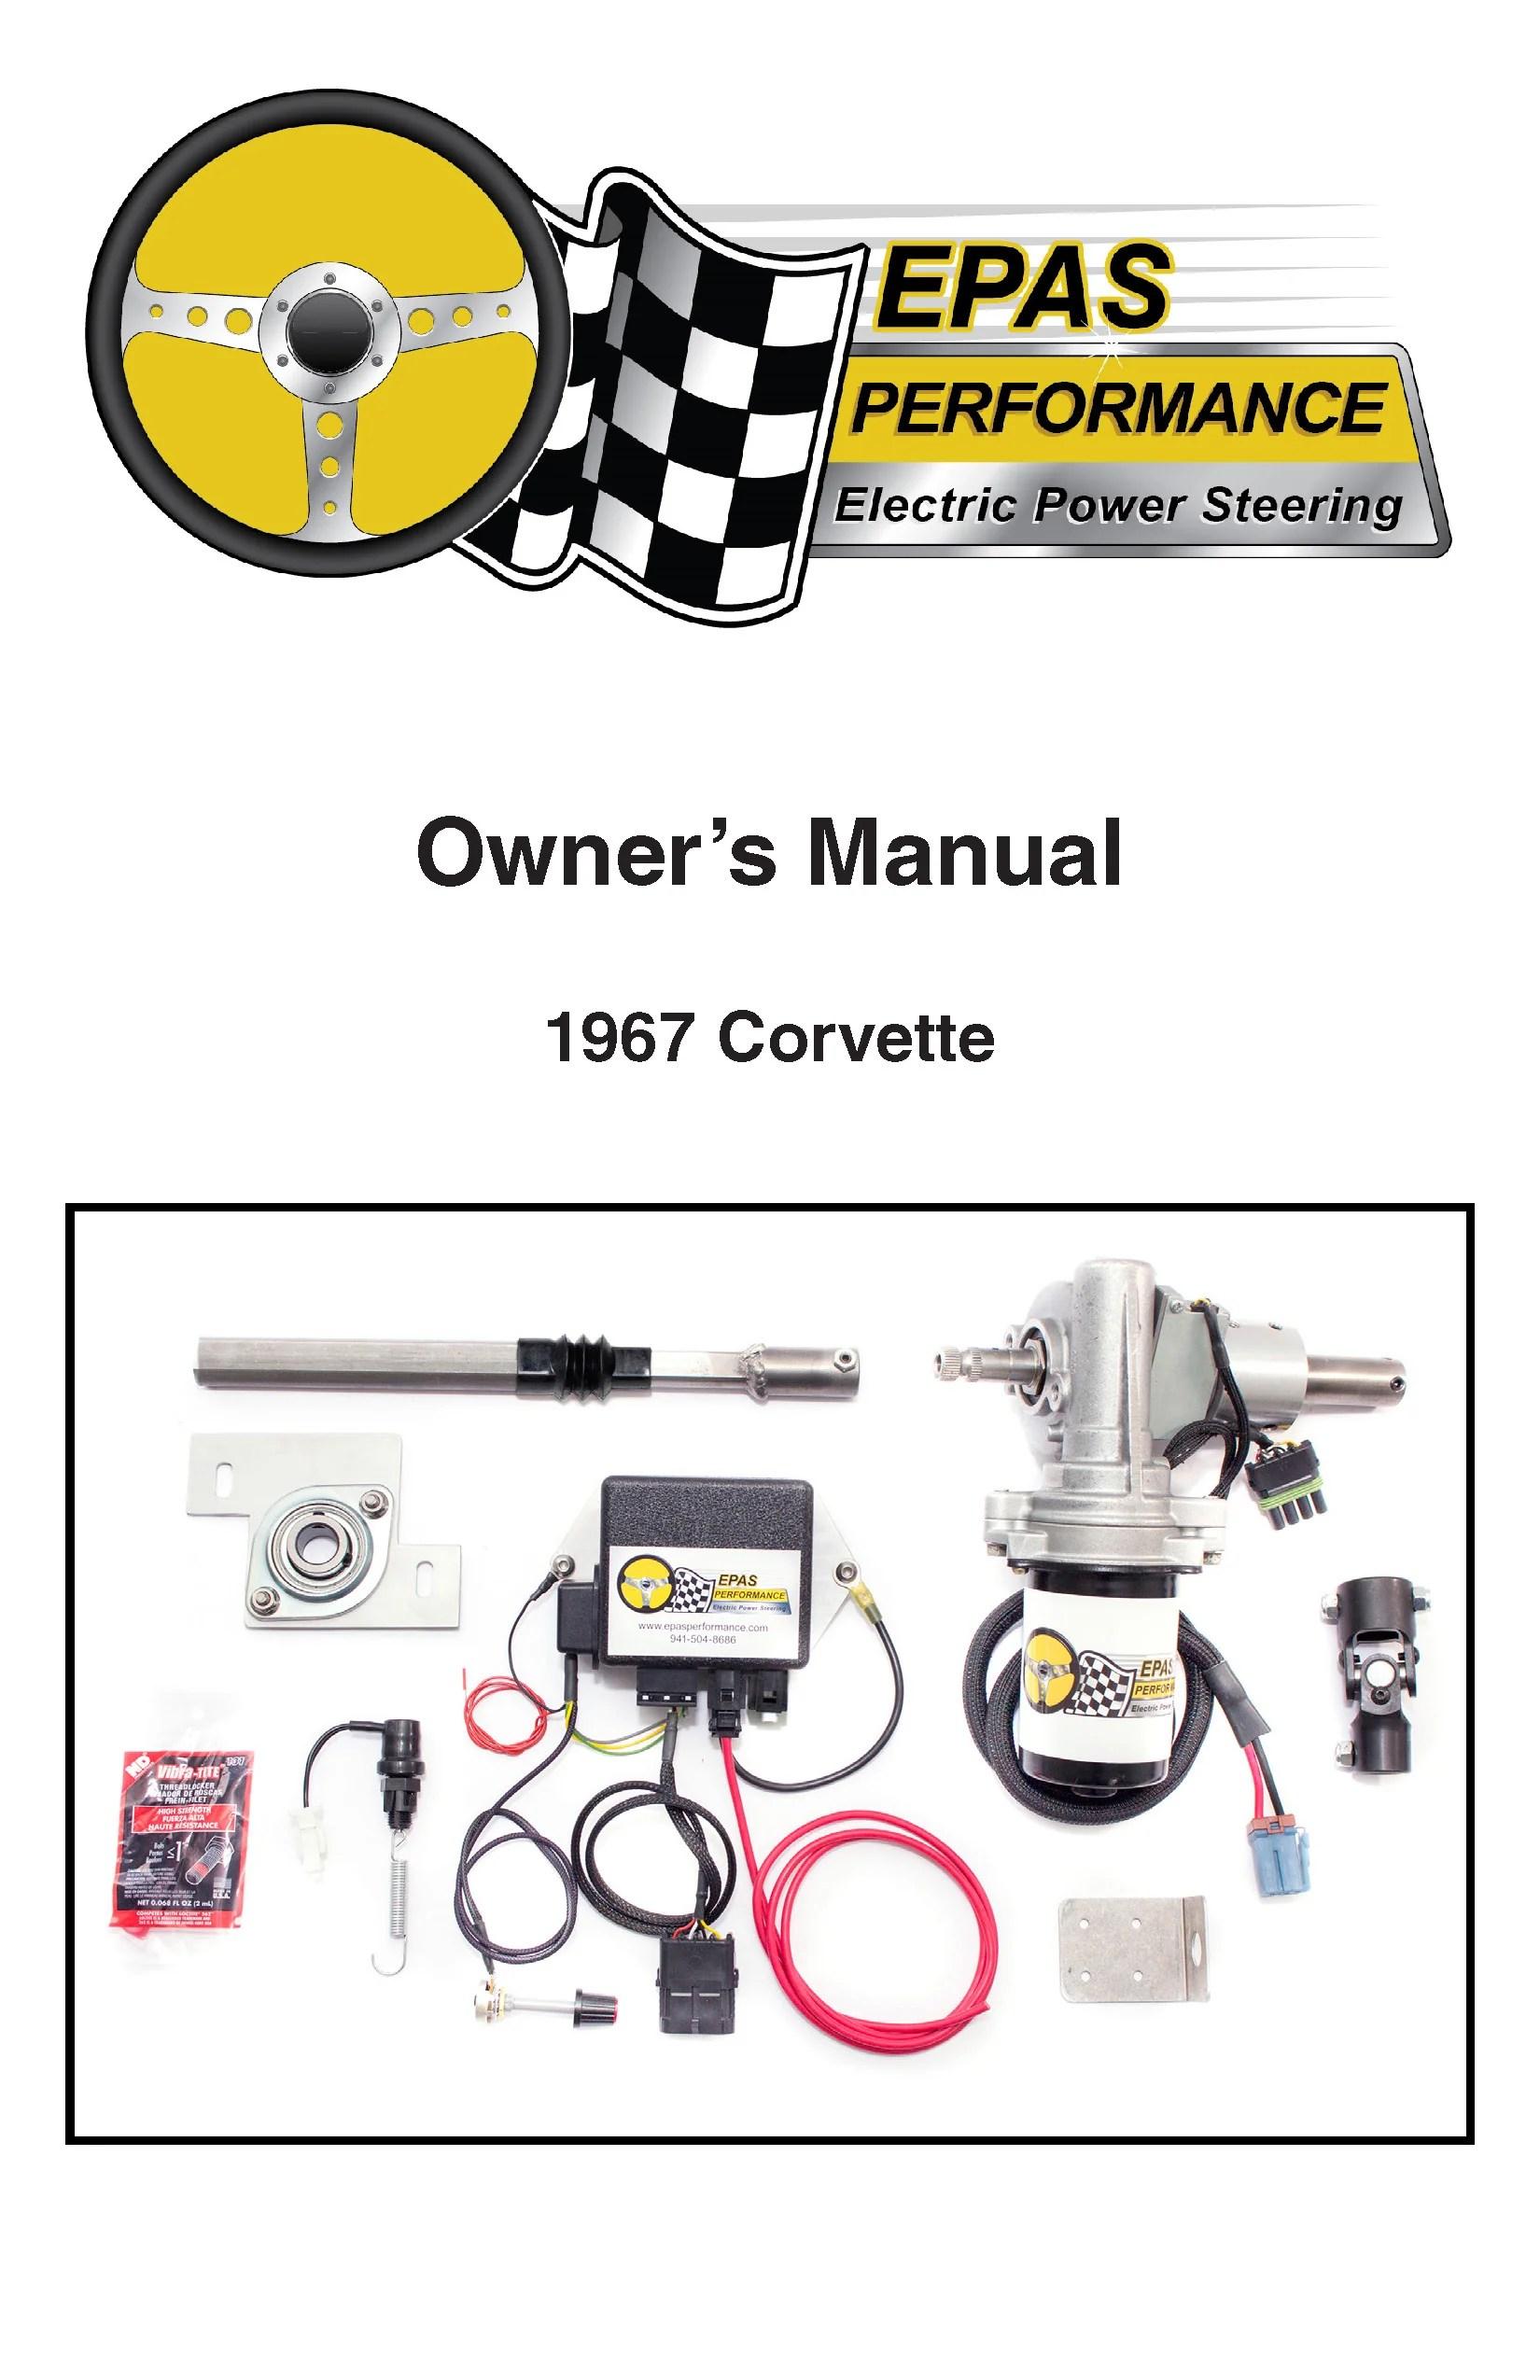 small resolution of 1967 corvette click to open download pdf